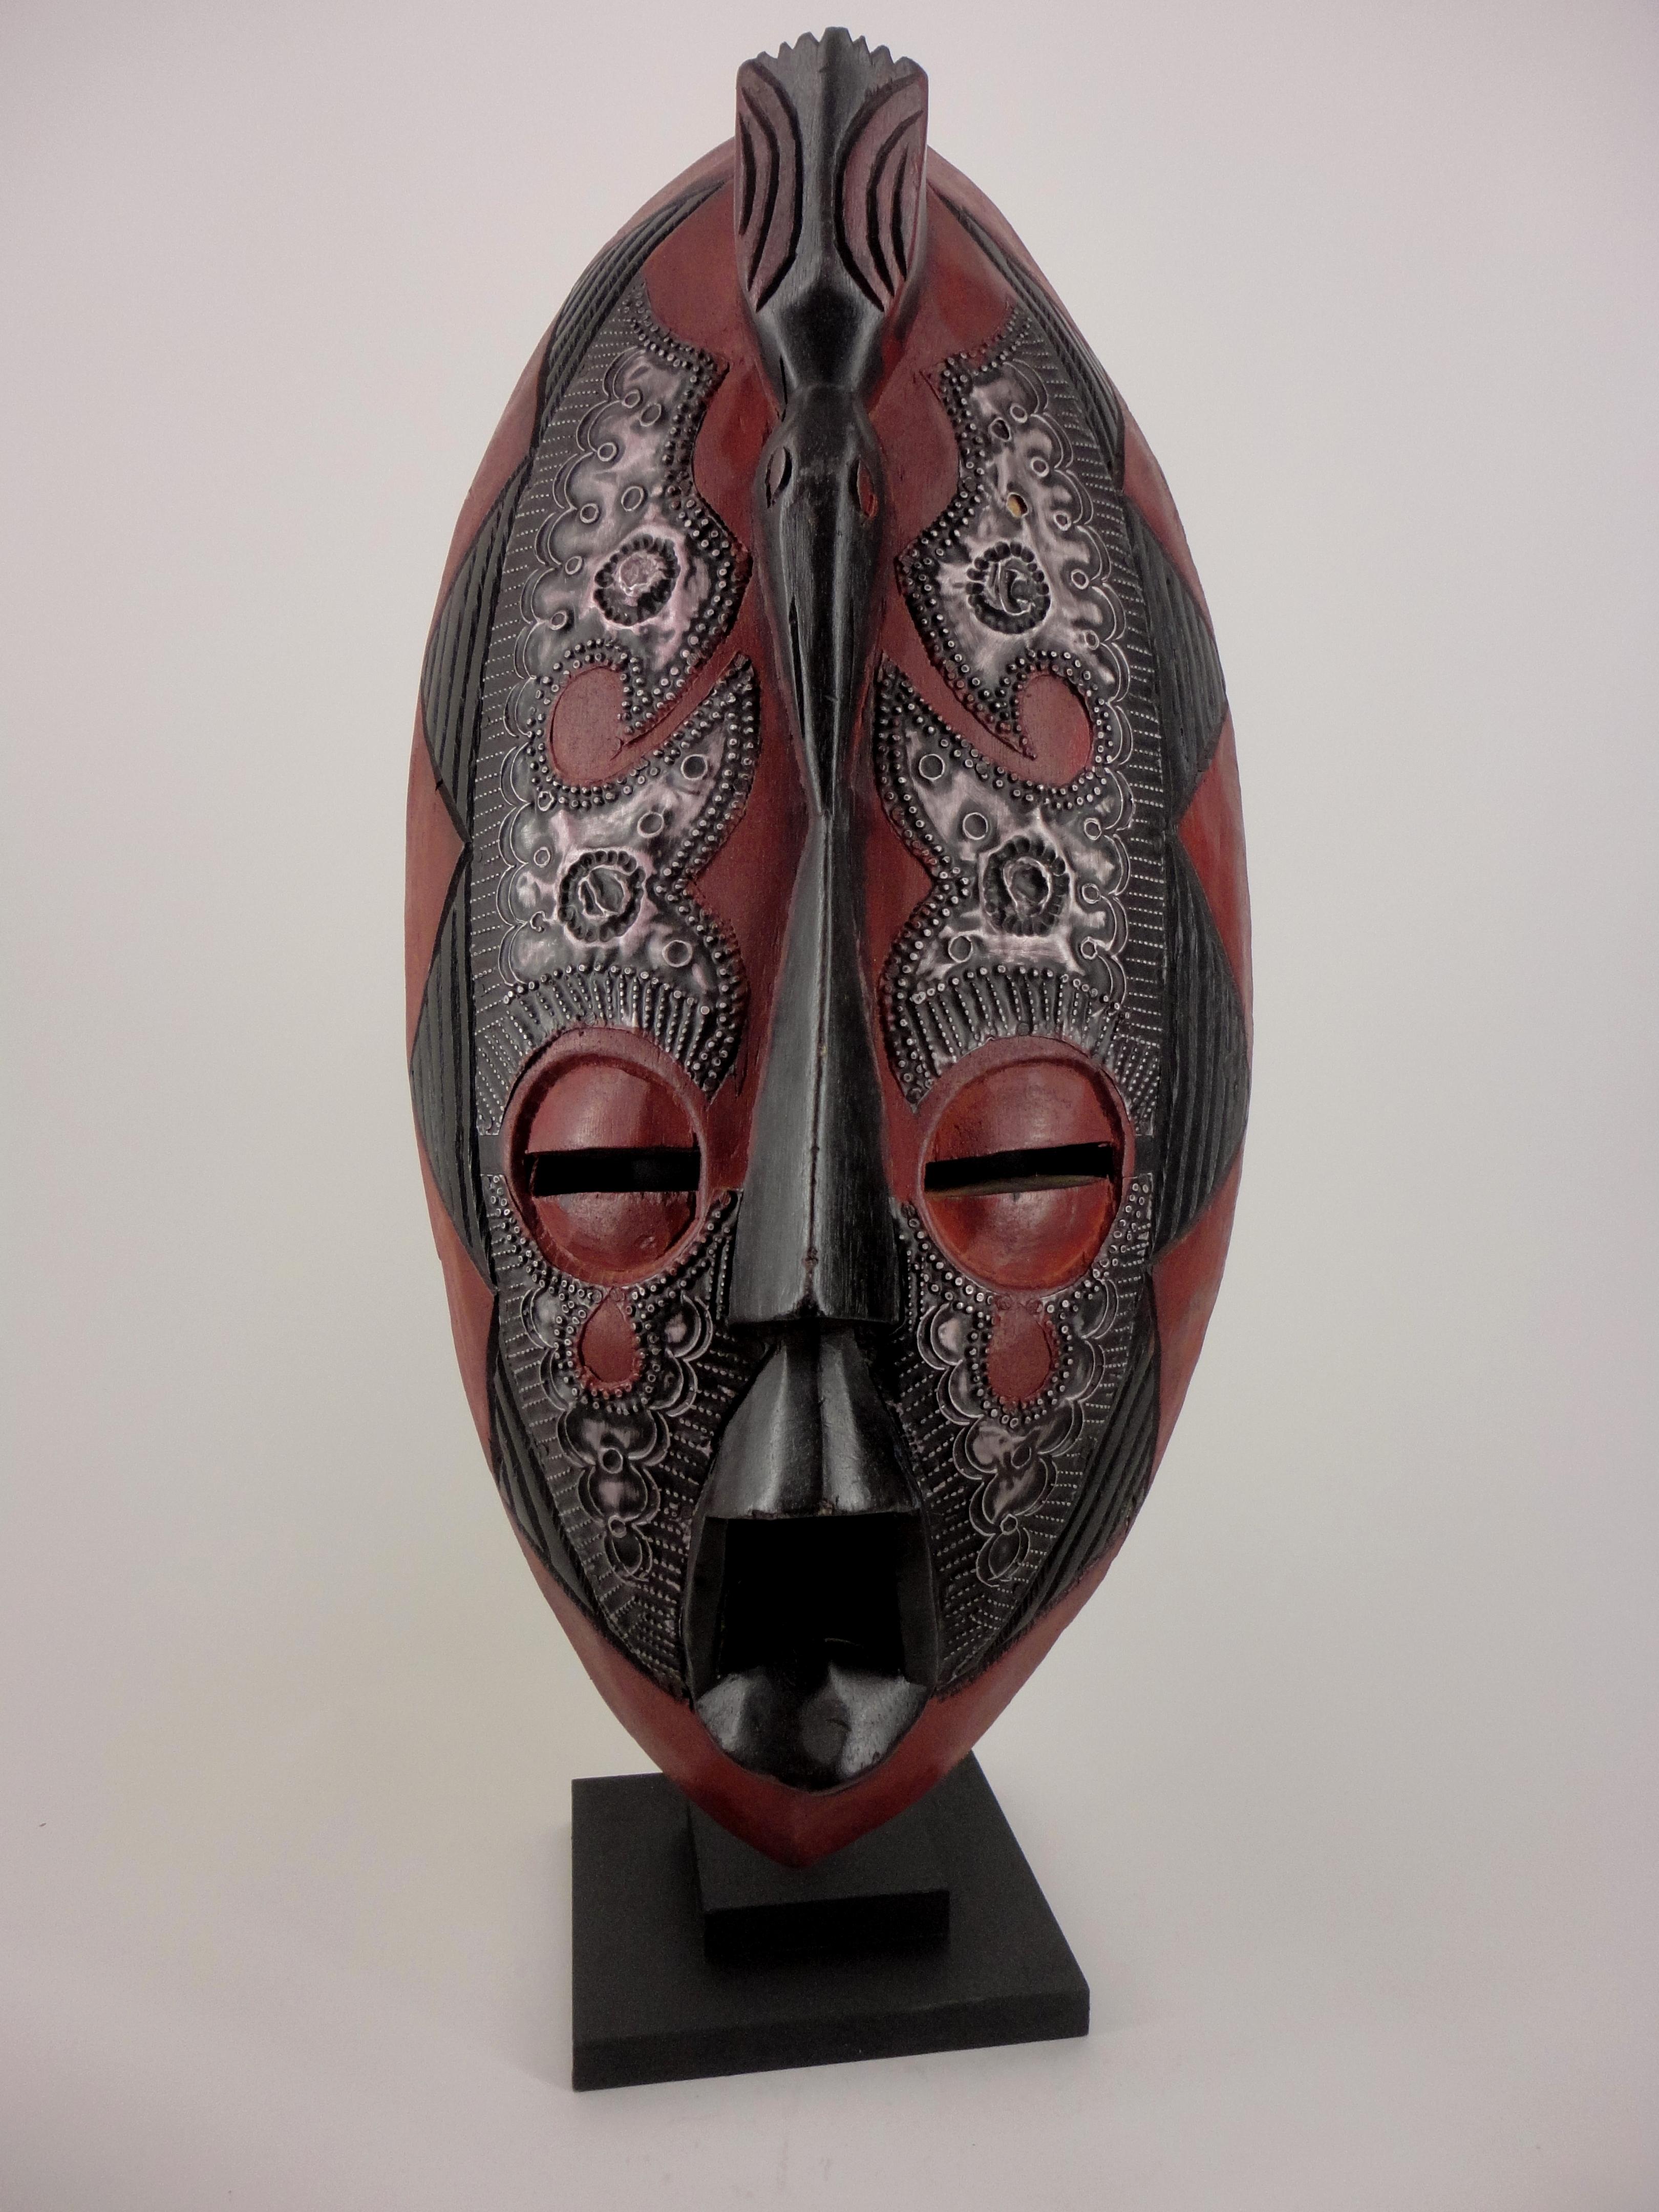 masken zeitgen ssischer art archives baku trading gmbh. Black Bedroom Furniture Sets. Home Design Ideas